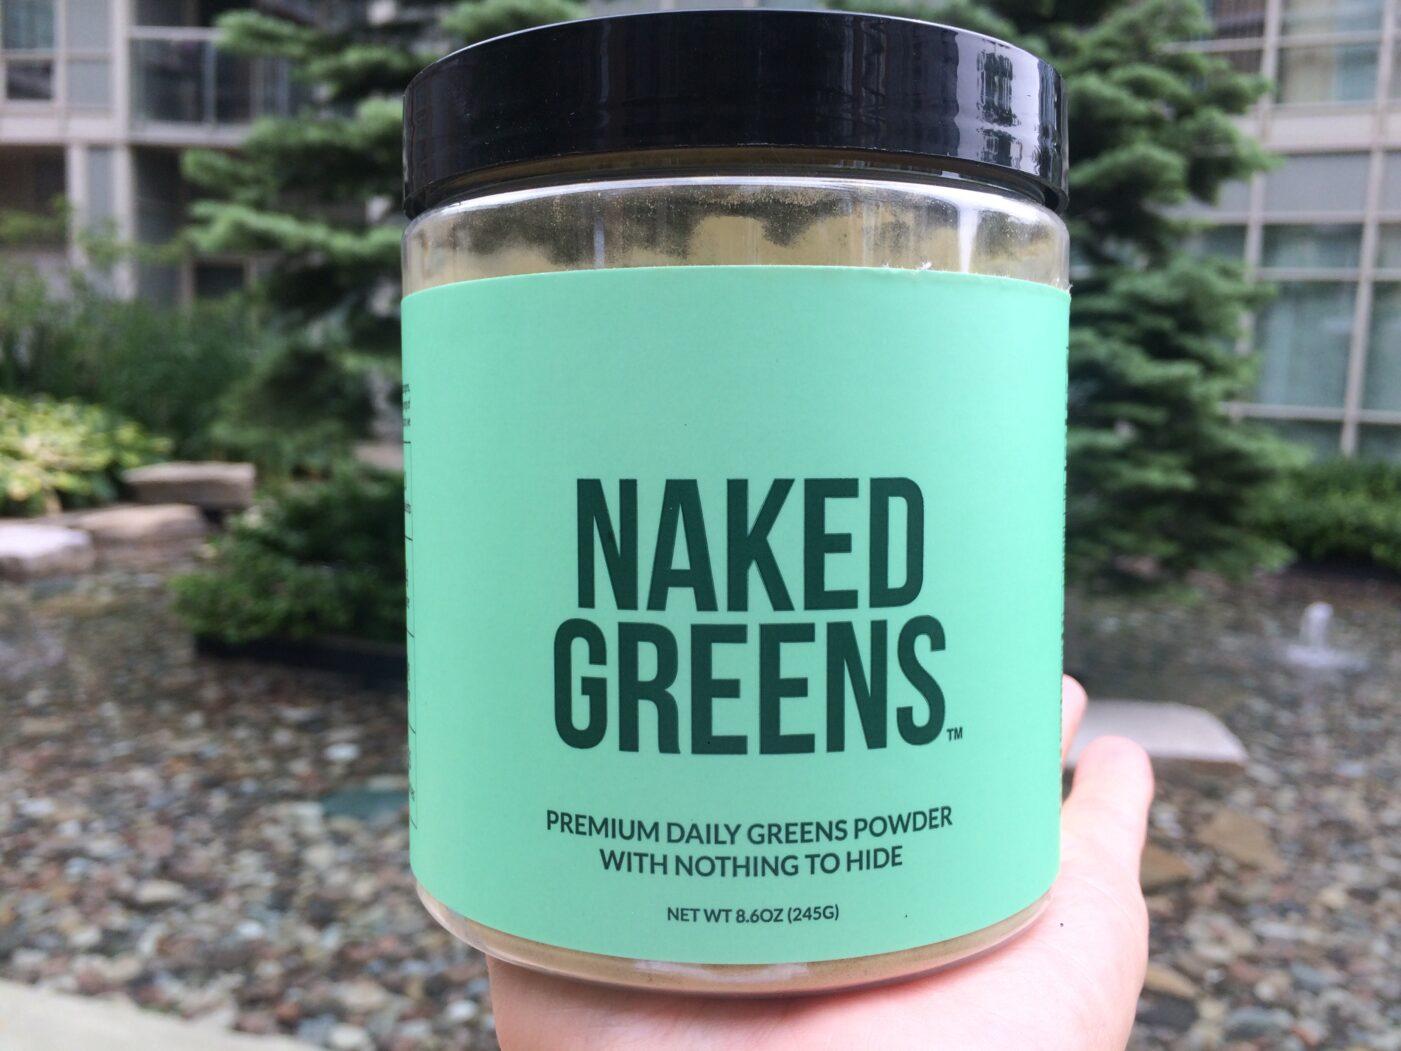 NAKED-Greens